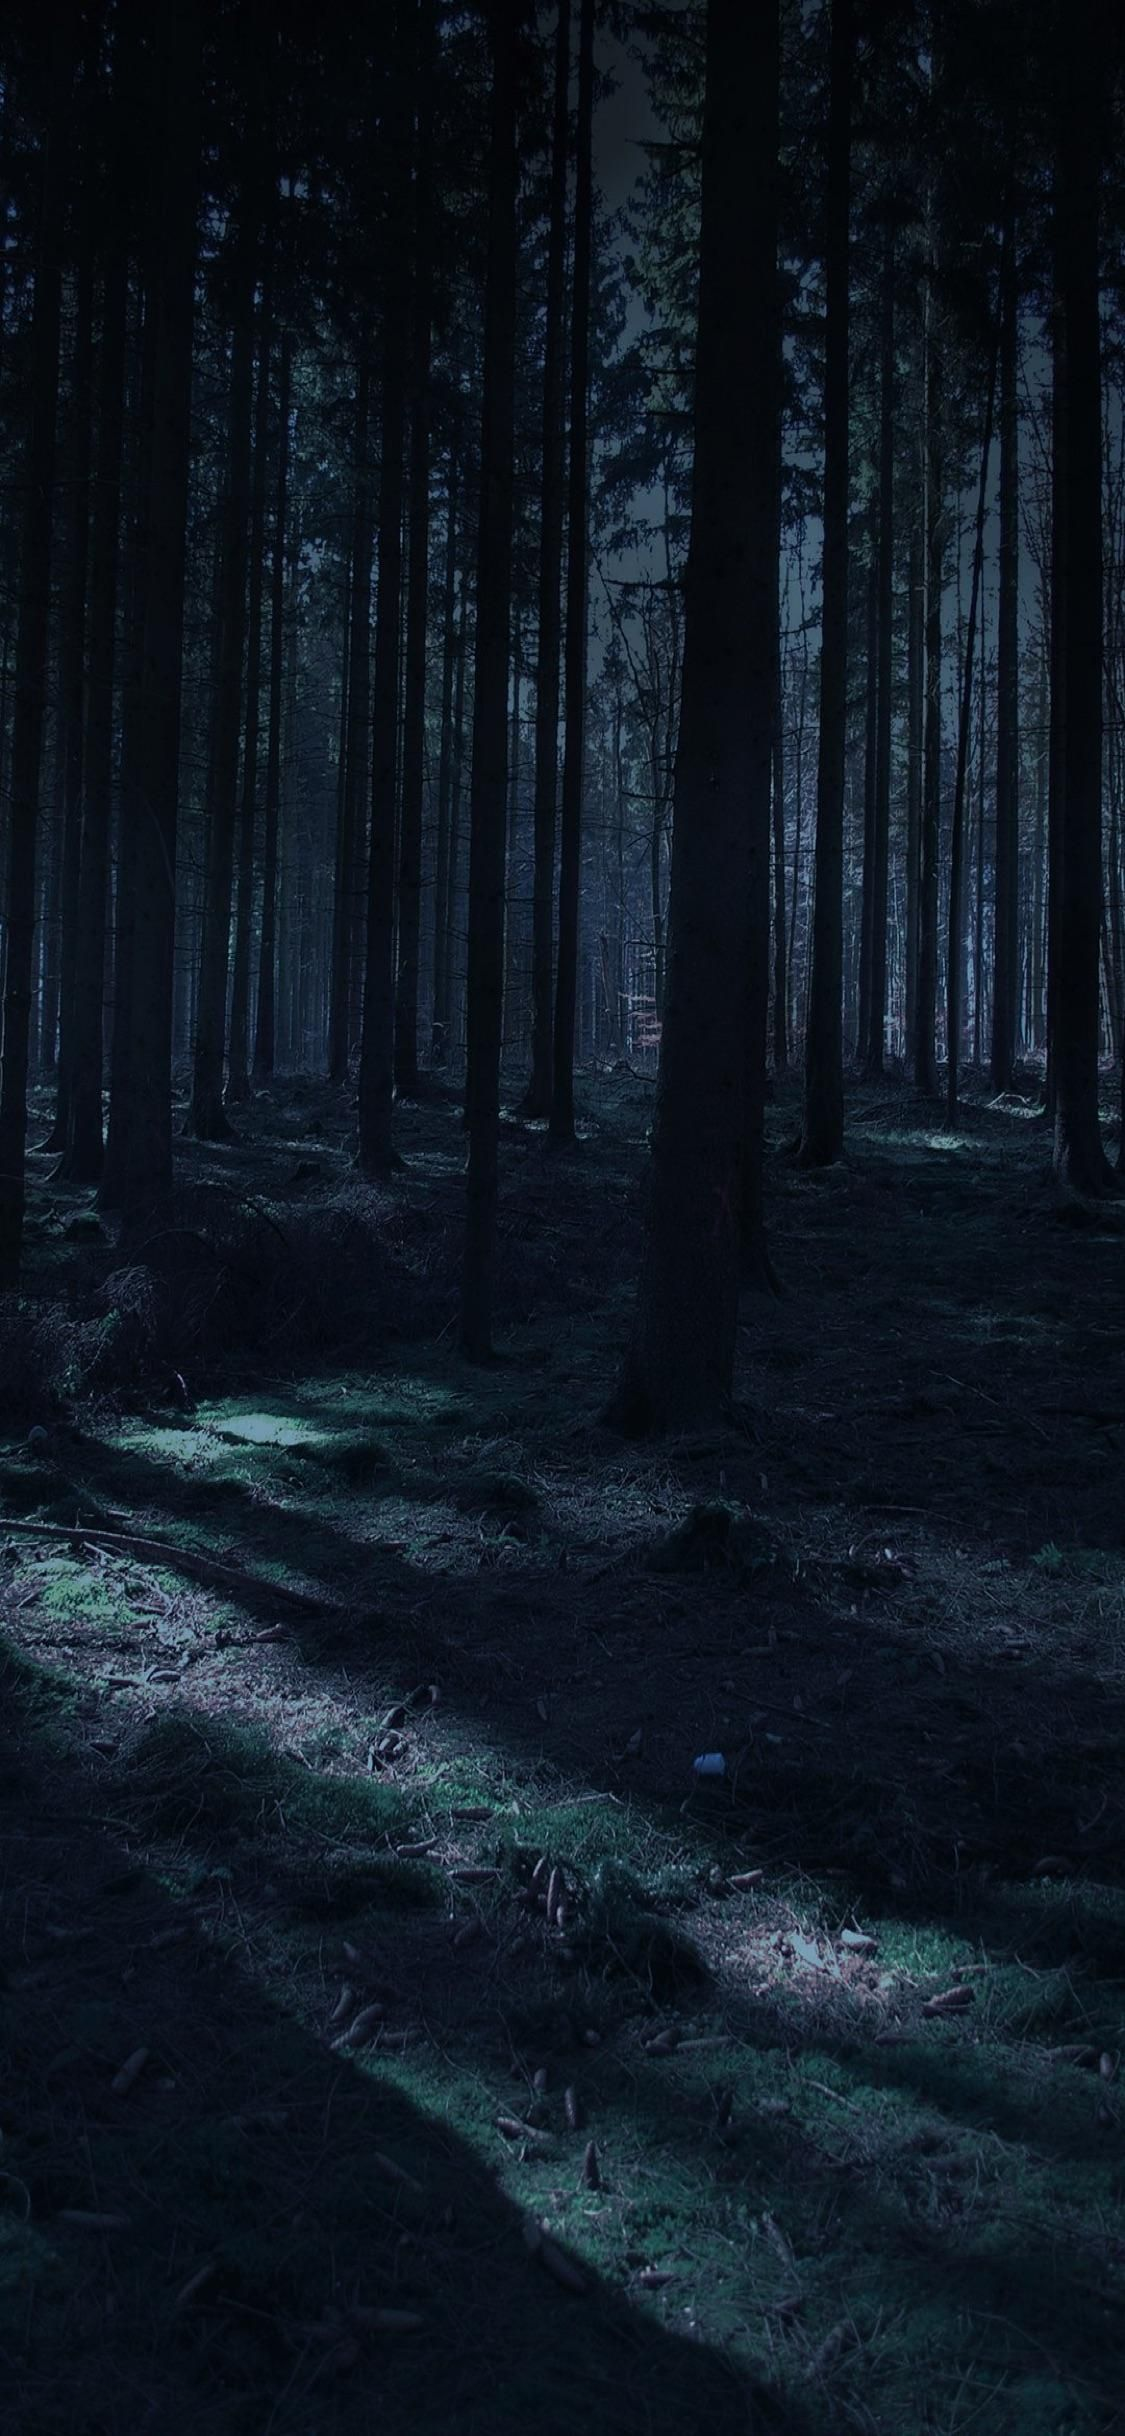 Dark Forest Iphone Wallpaper : forest, iphone, wallpaper, Forest, IPhone, Wallpapers, Landscape,, Forest,, Photography